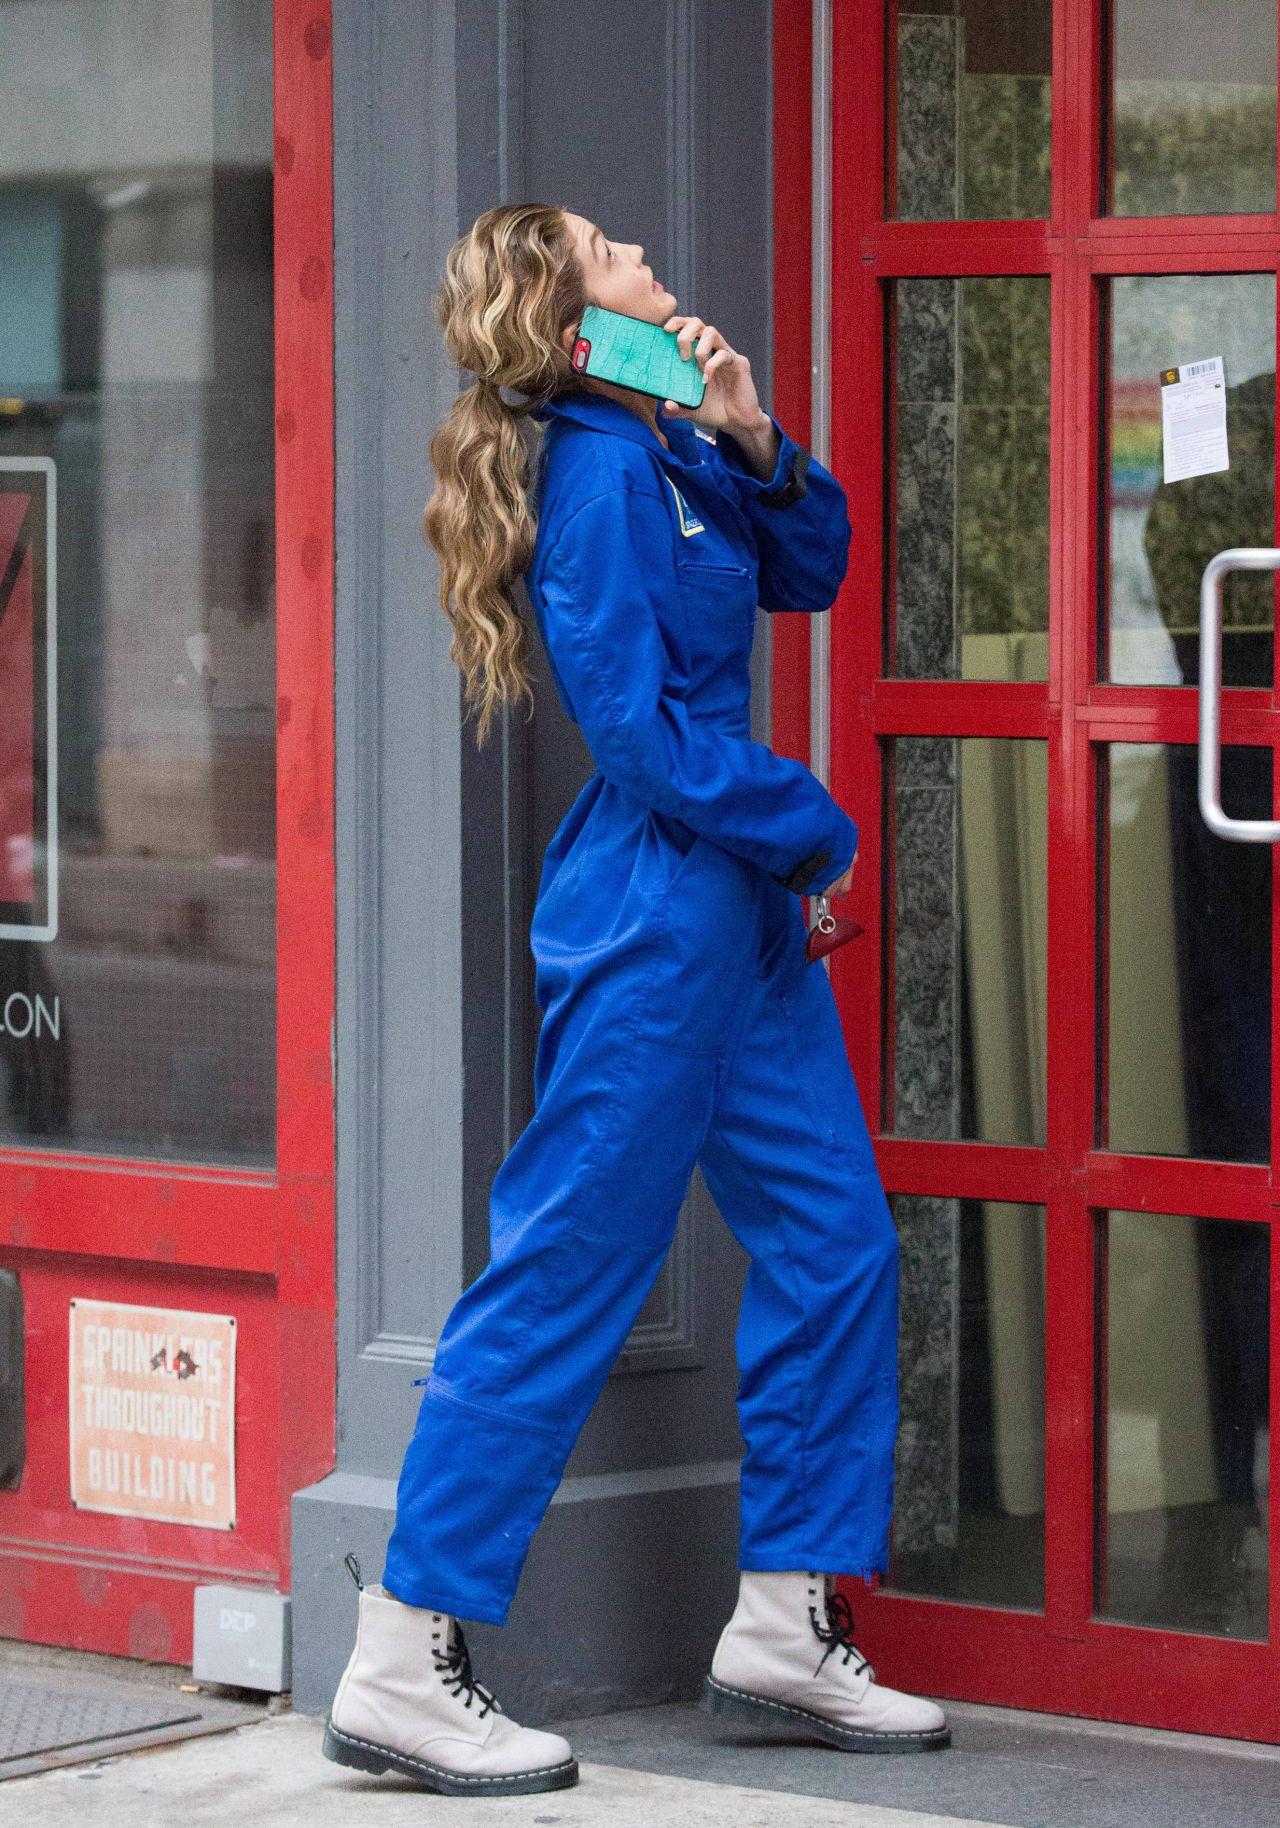 Gigi Hadid in a Blue NASA Jumpsuit - NYC 10/25/2017